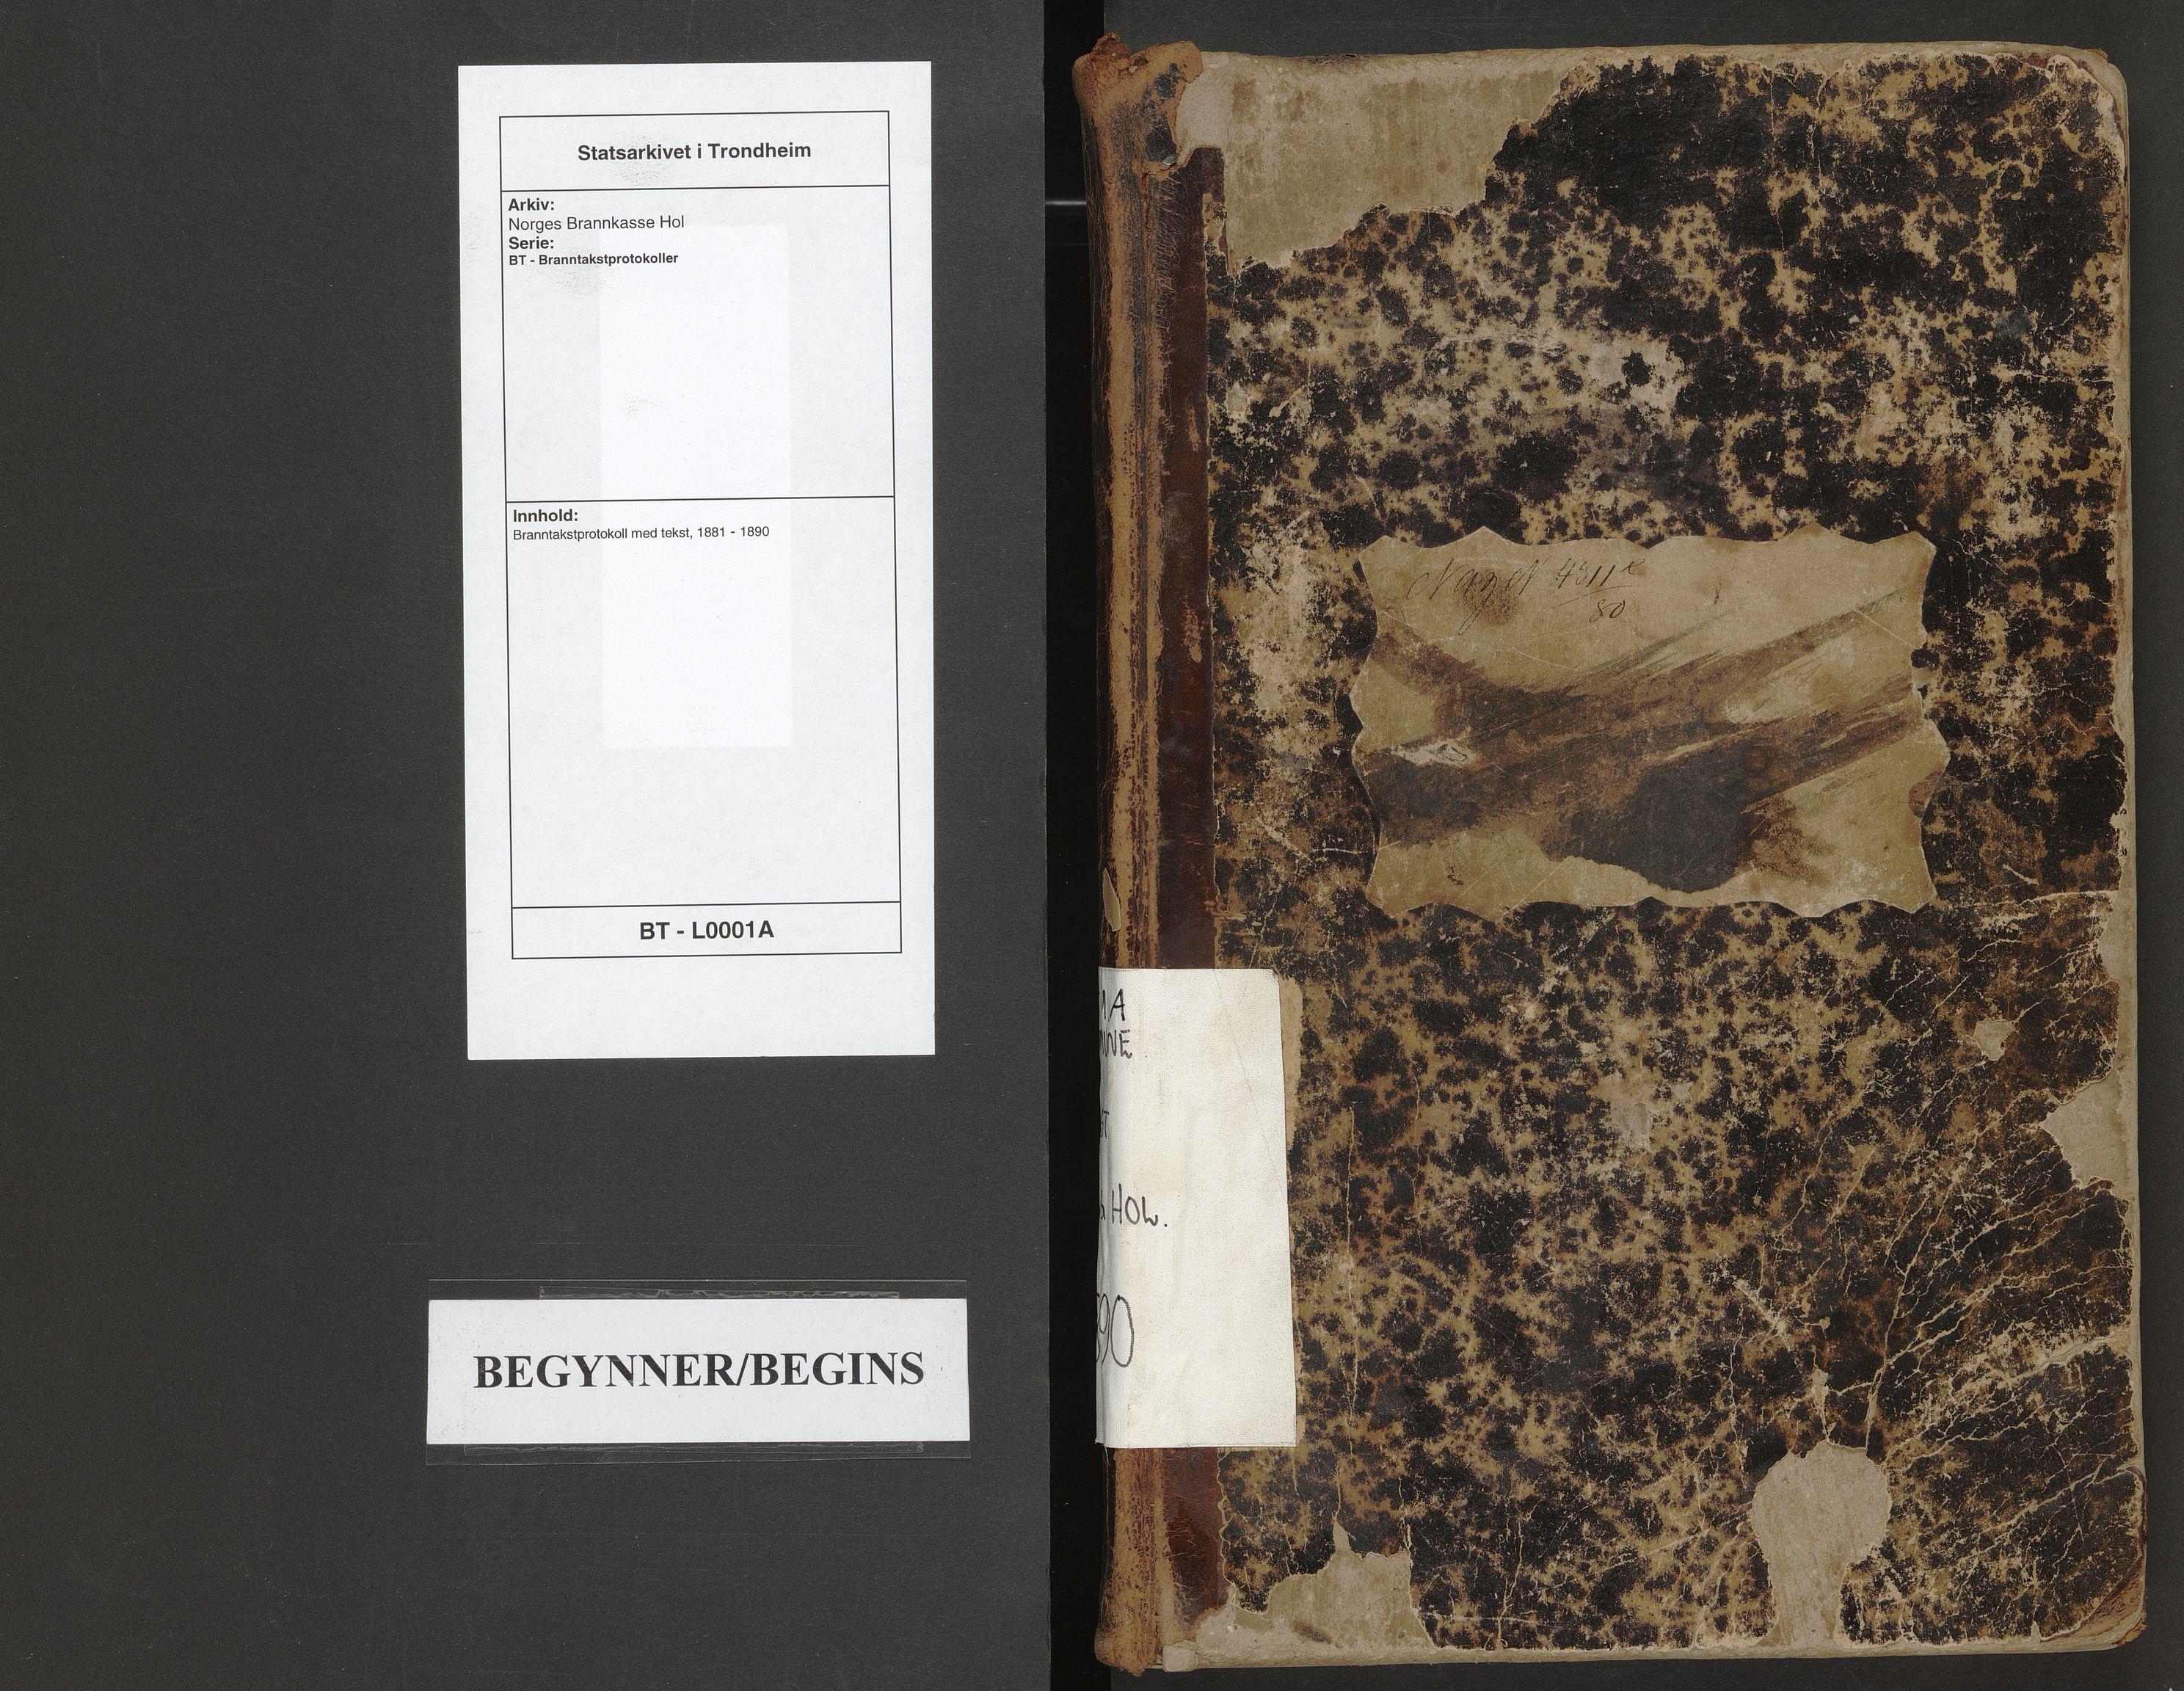 SAT, Norges Brannkasse Hol, BT/L0001A: Branntakstprotokoll med tekst, 1881-1890